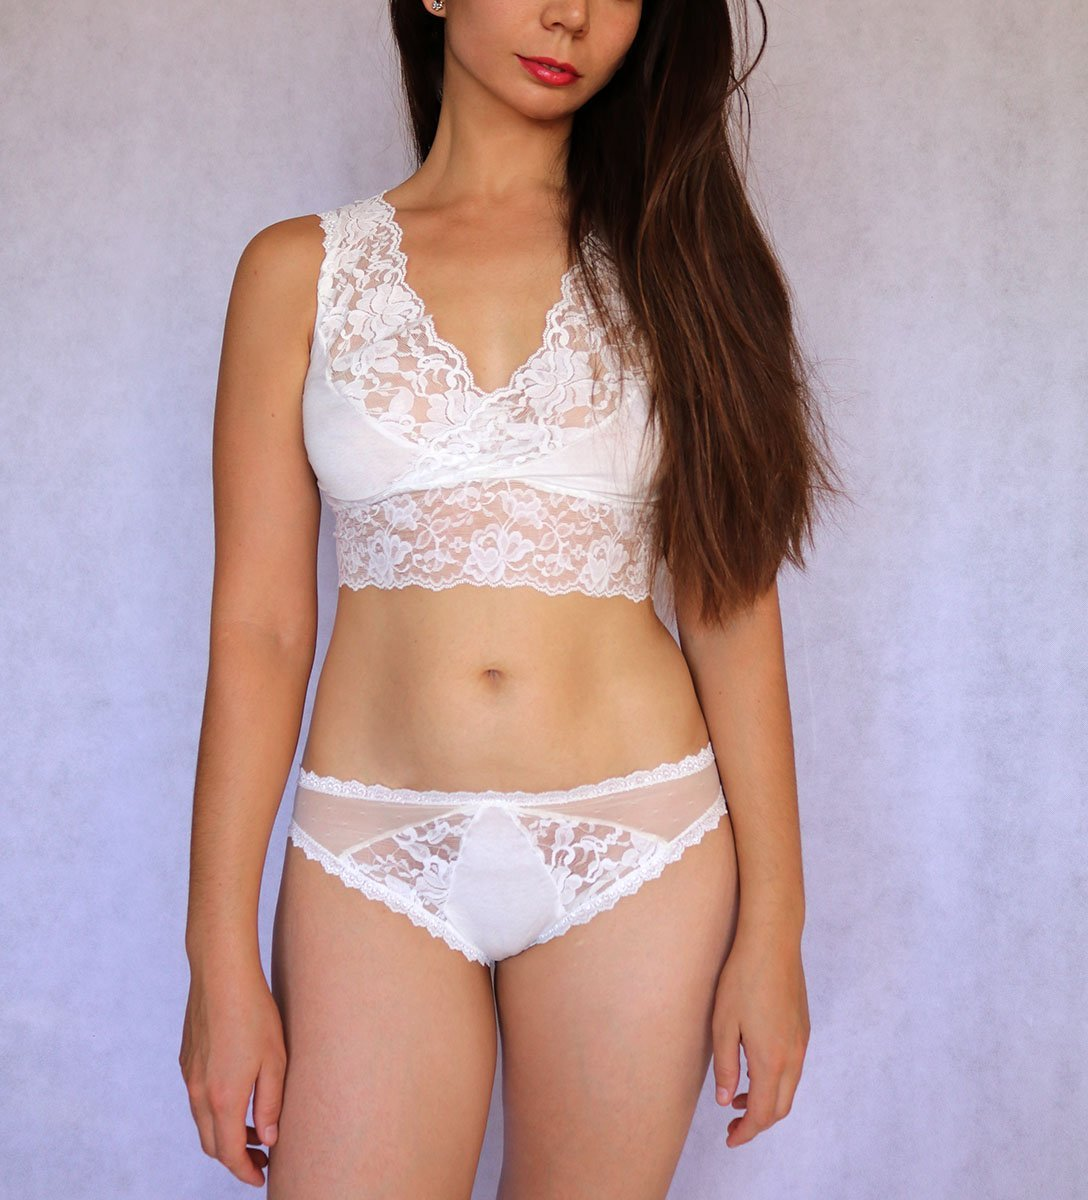 c66e682c73 Amazon.com  Ivory Lace Bralette Top. Sleep Bra. Bridal Lingerie. Wedding Bra.   Handmade